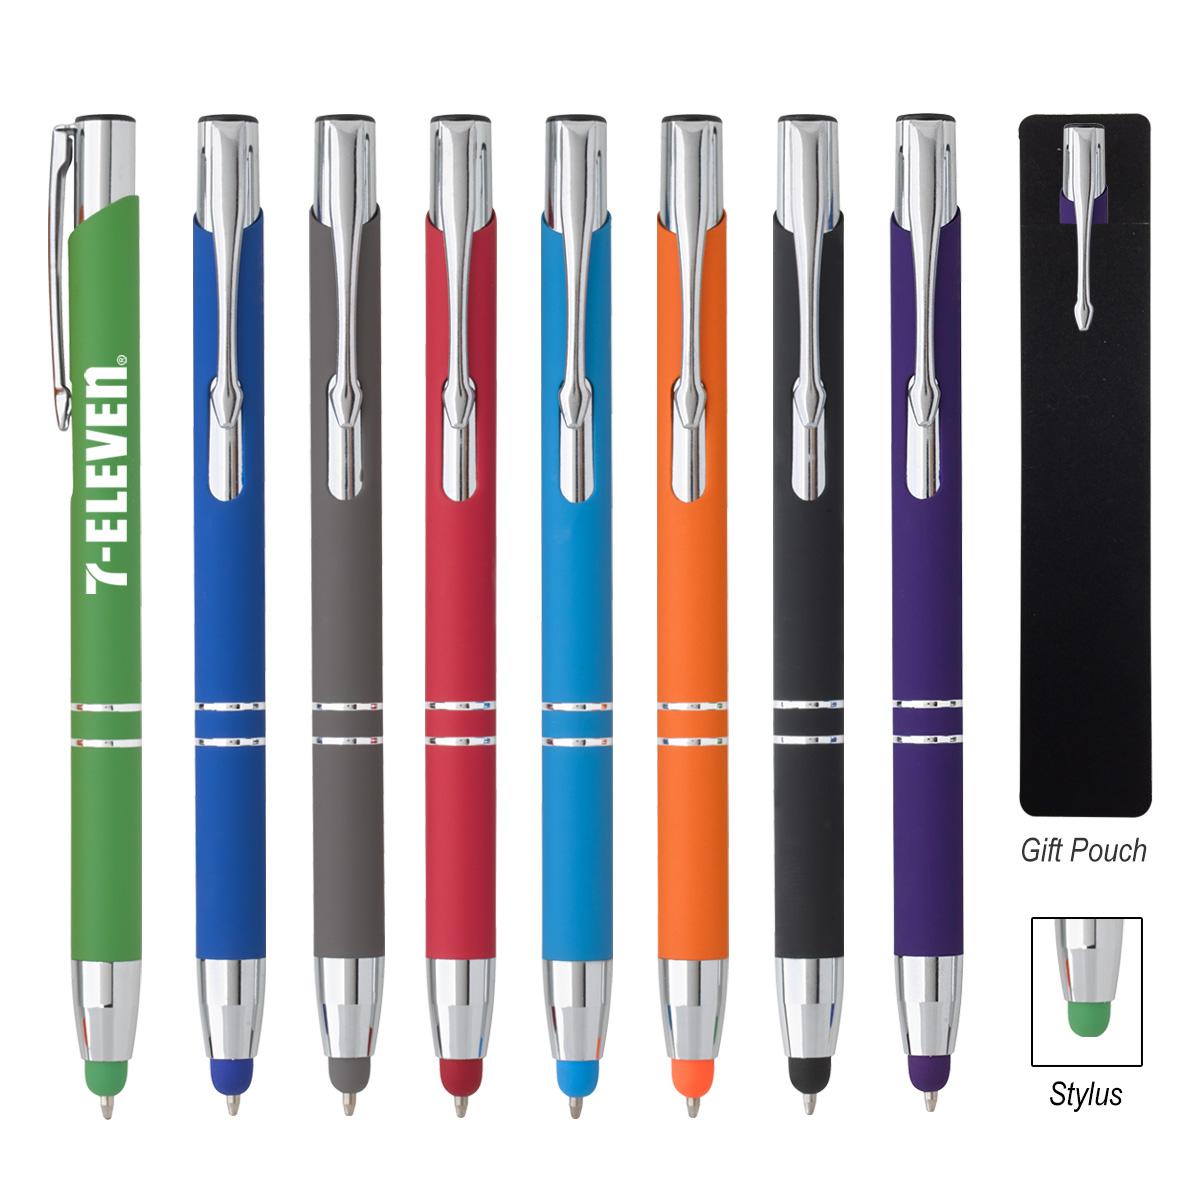 #CM 748 Dash Stylus Pen